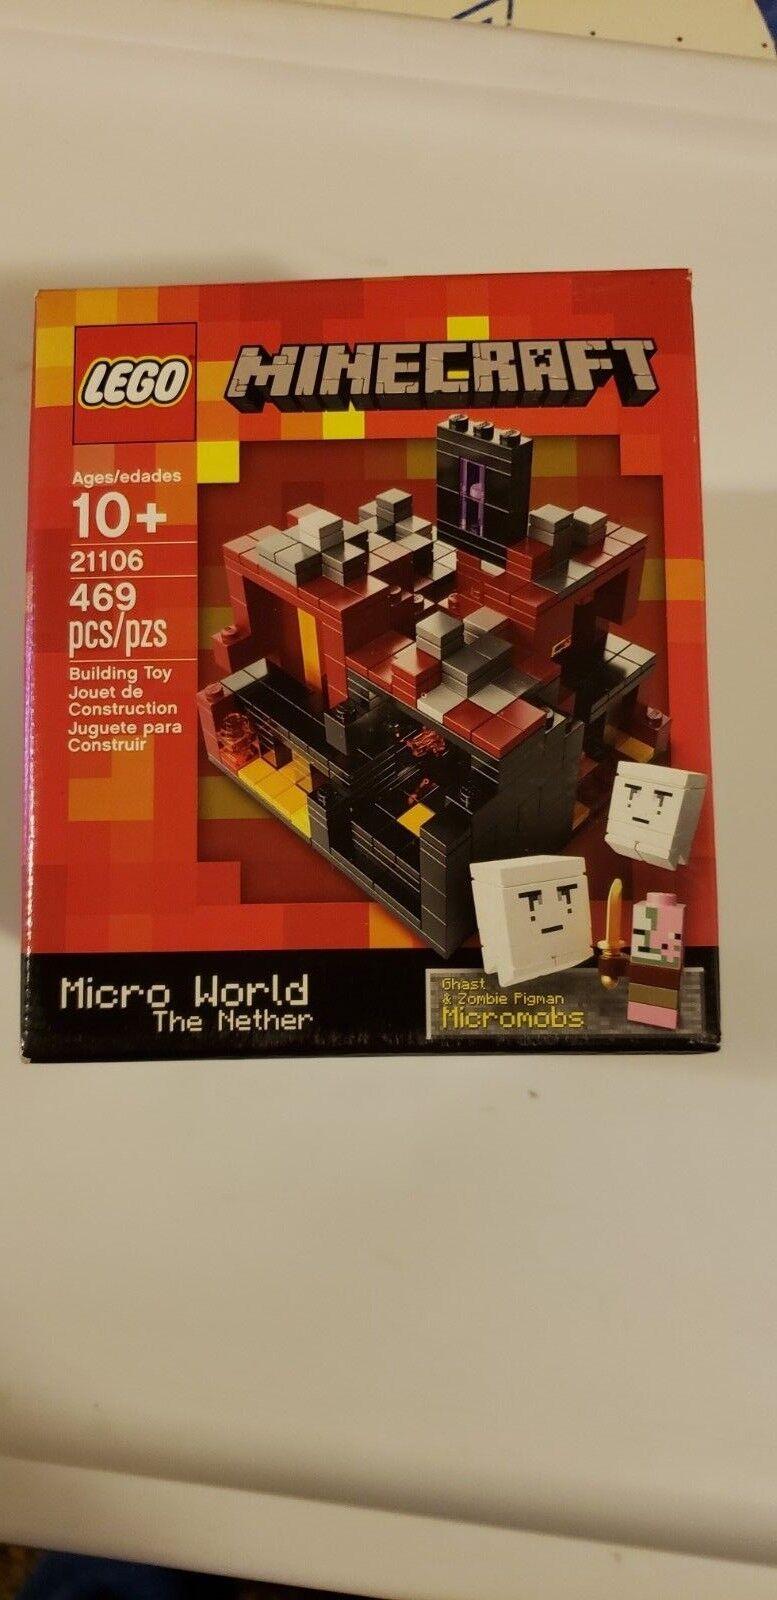 New LEGO 21106 Minecraft Micro World The Nether ROT  3 RetiROT Sealed